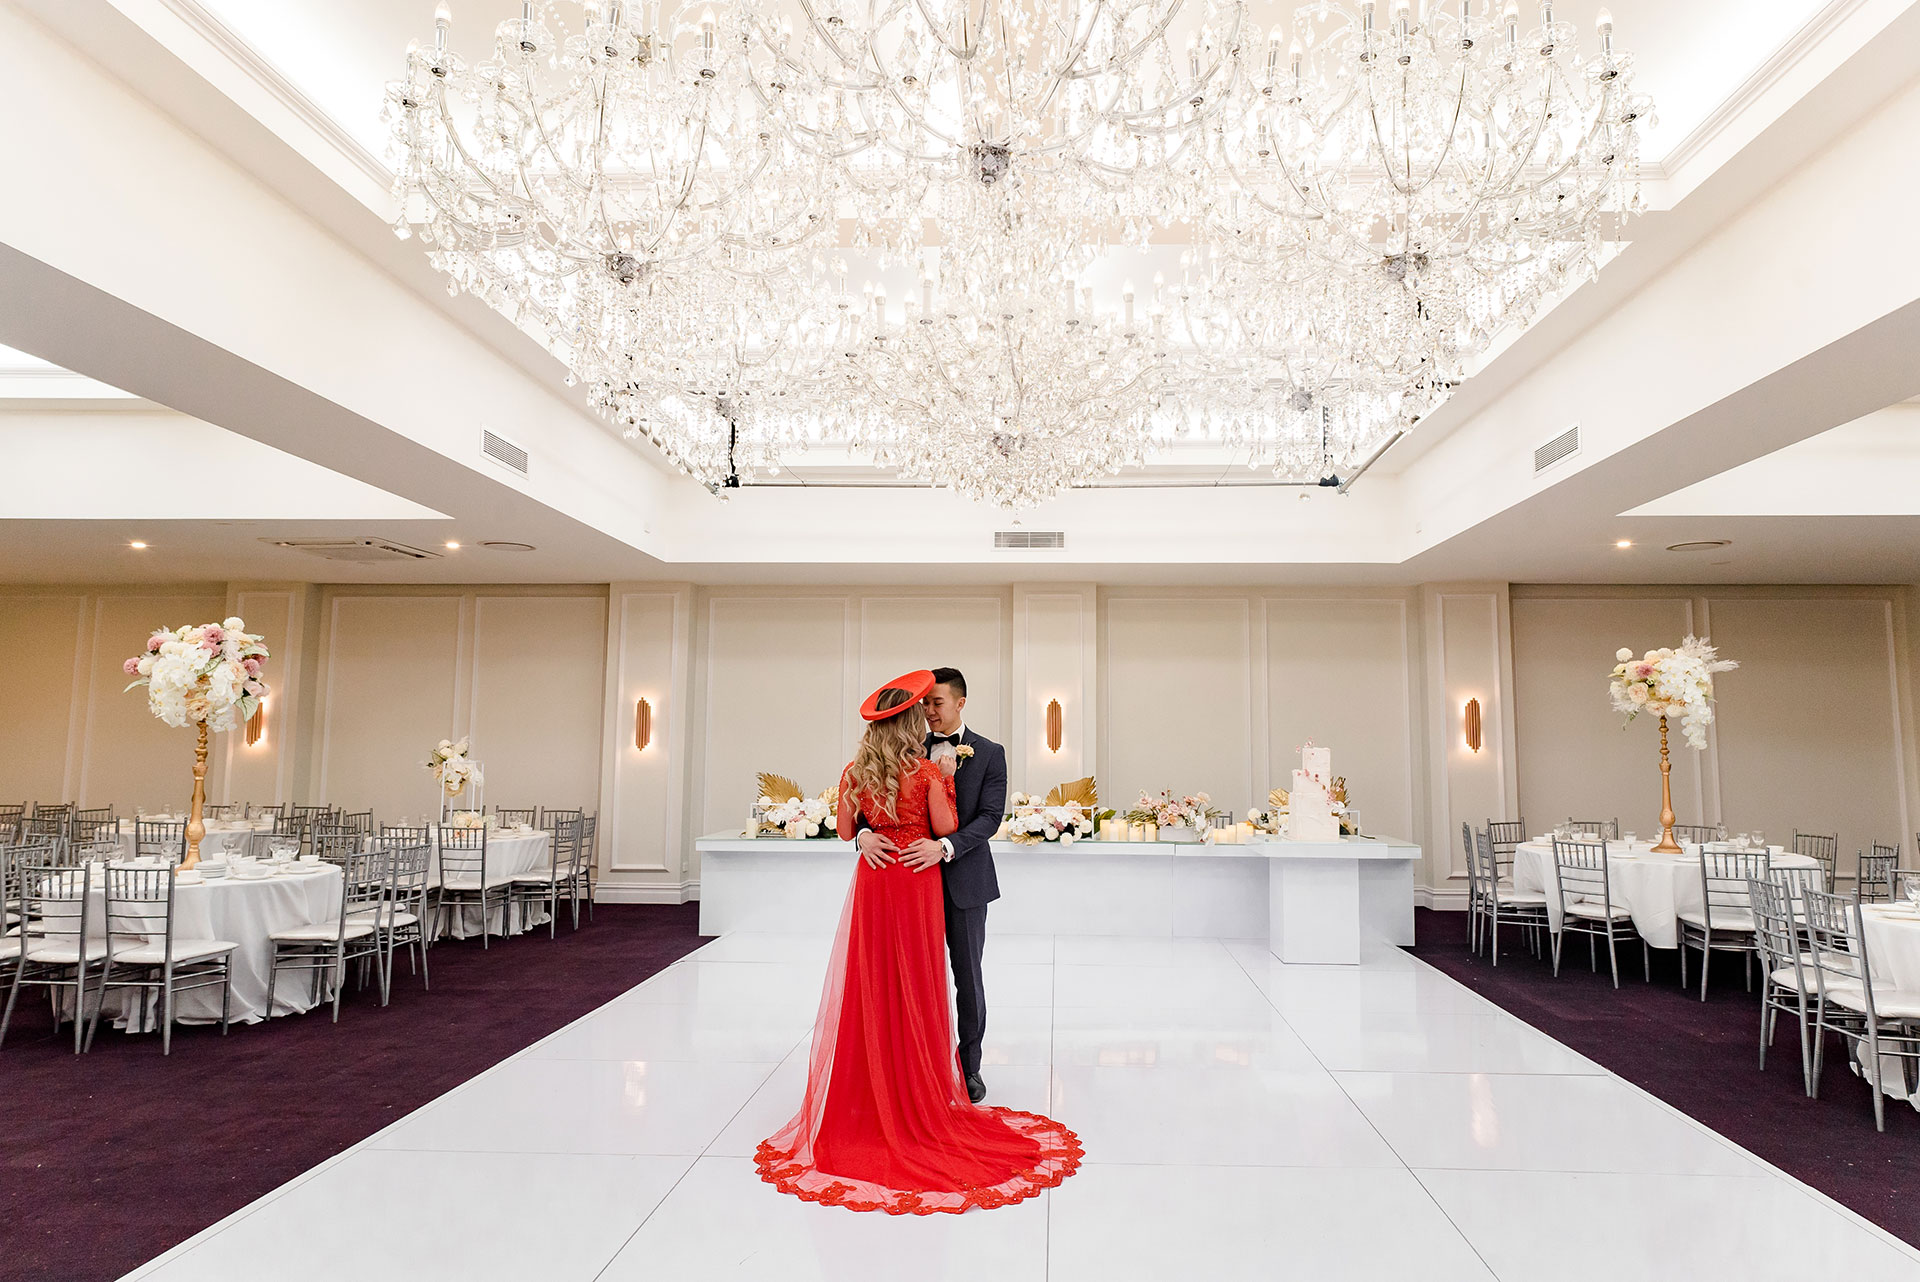 chinese-wedding-seafood-banquet-reception-venue.jpg